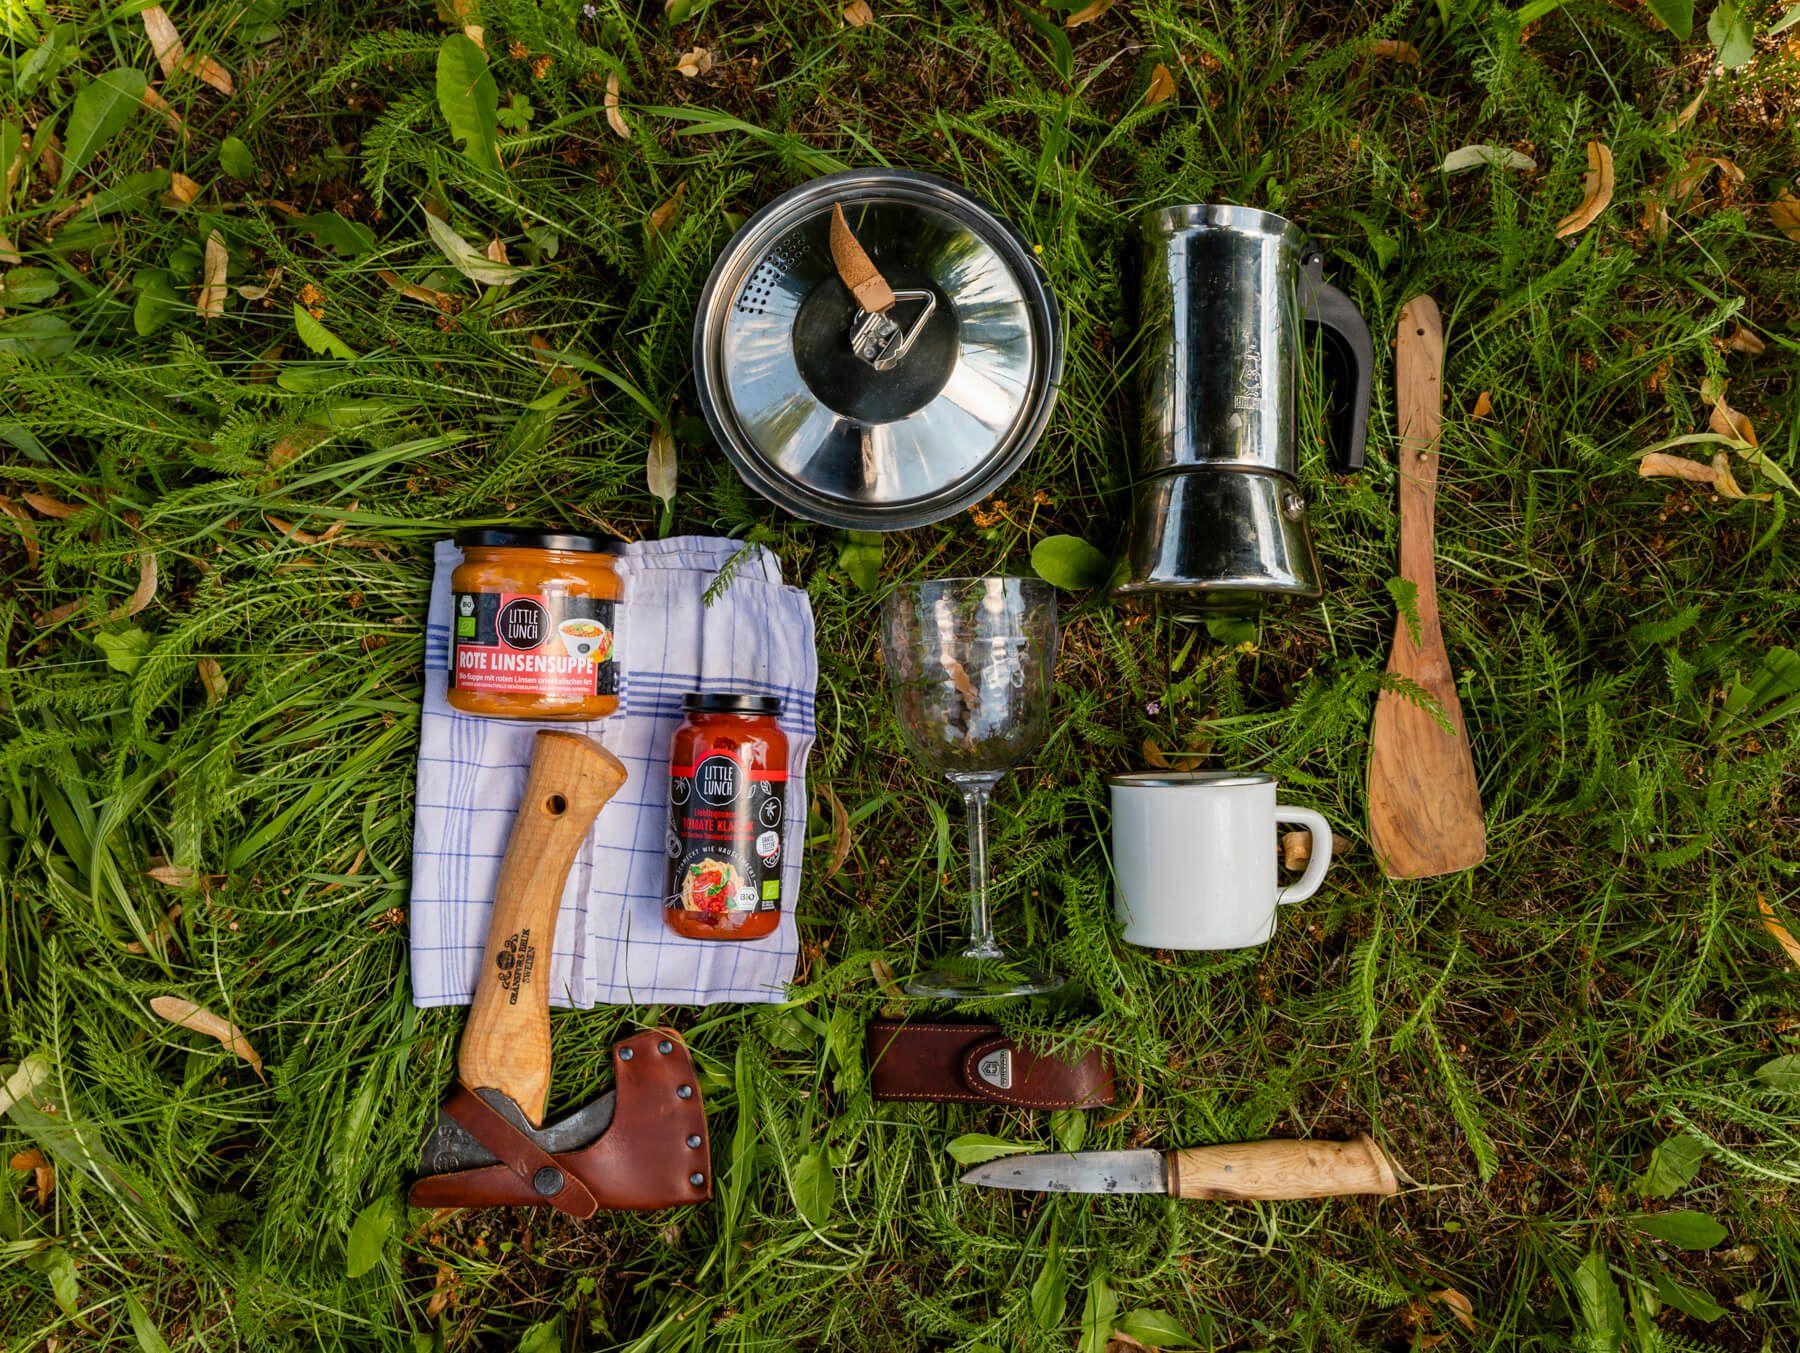 Outdoor Kochen Schnelle Einfache Camping Rezepte Little Lunch